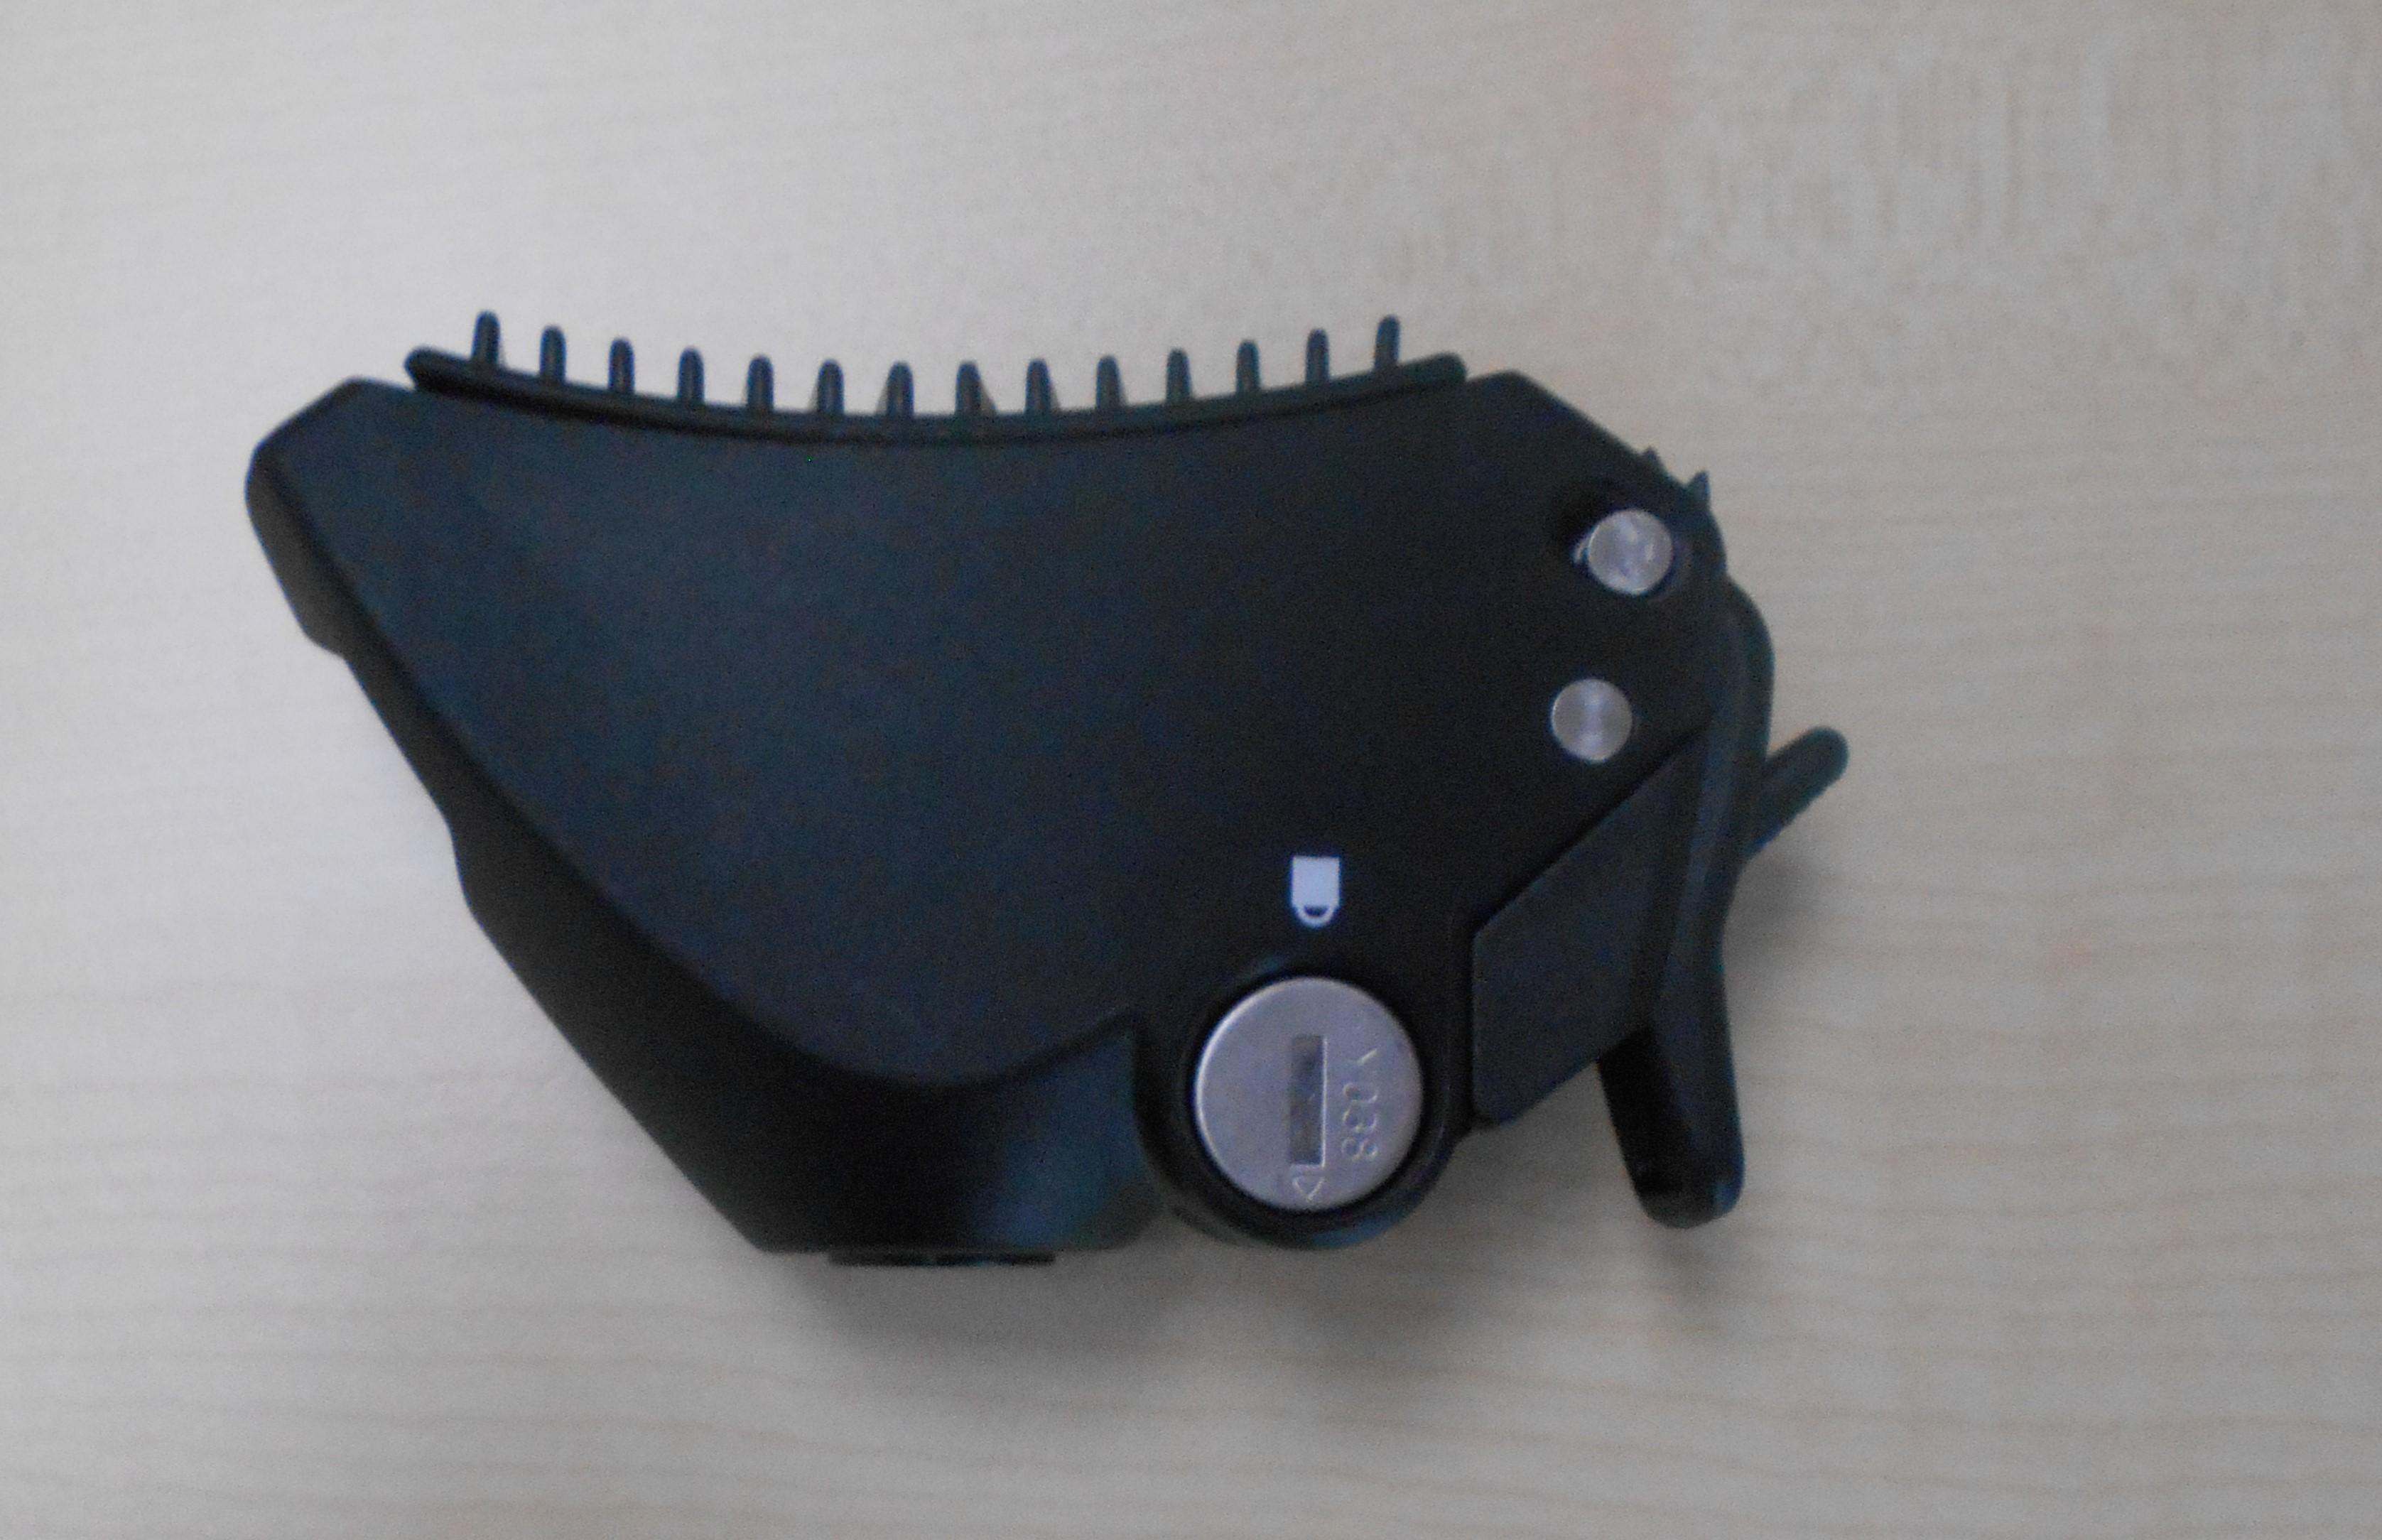 Kopf E-Bike Rahmenhalter mit Schlosscode Y017